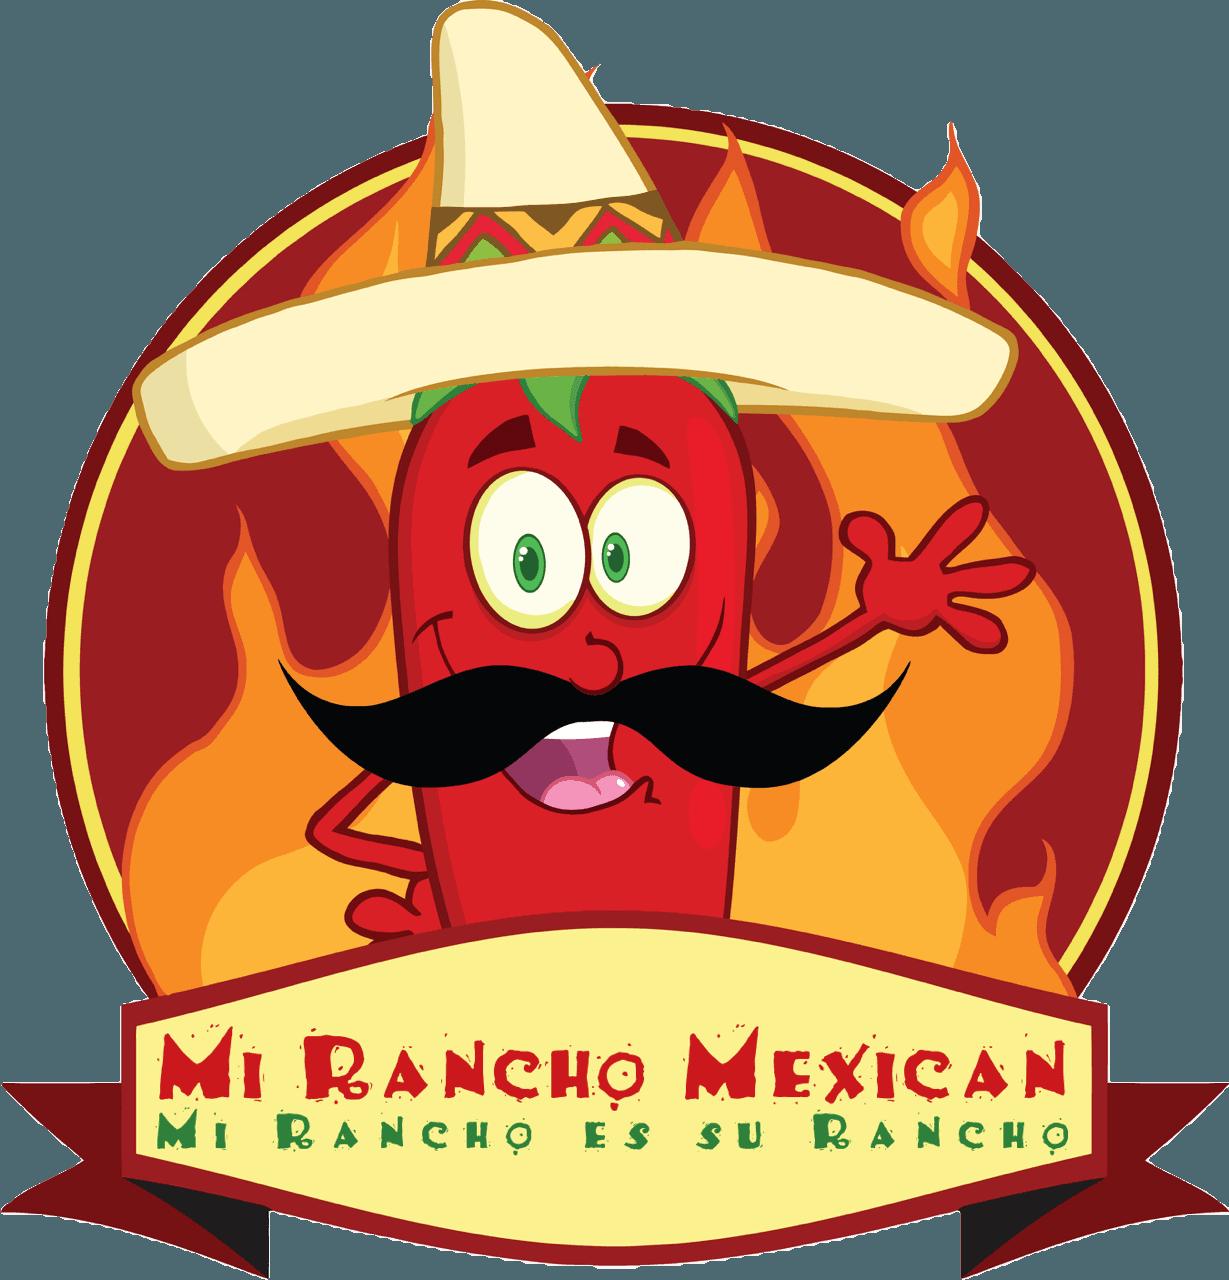 Nacho clipart restaurant mexican. Mi rancho va authentic